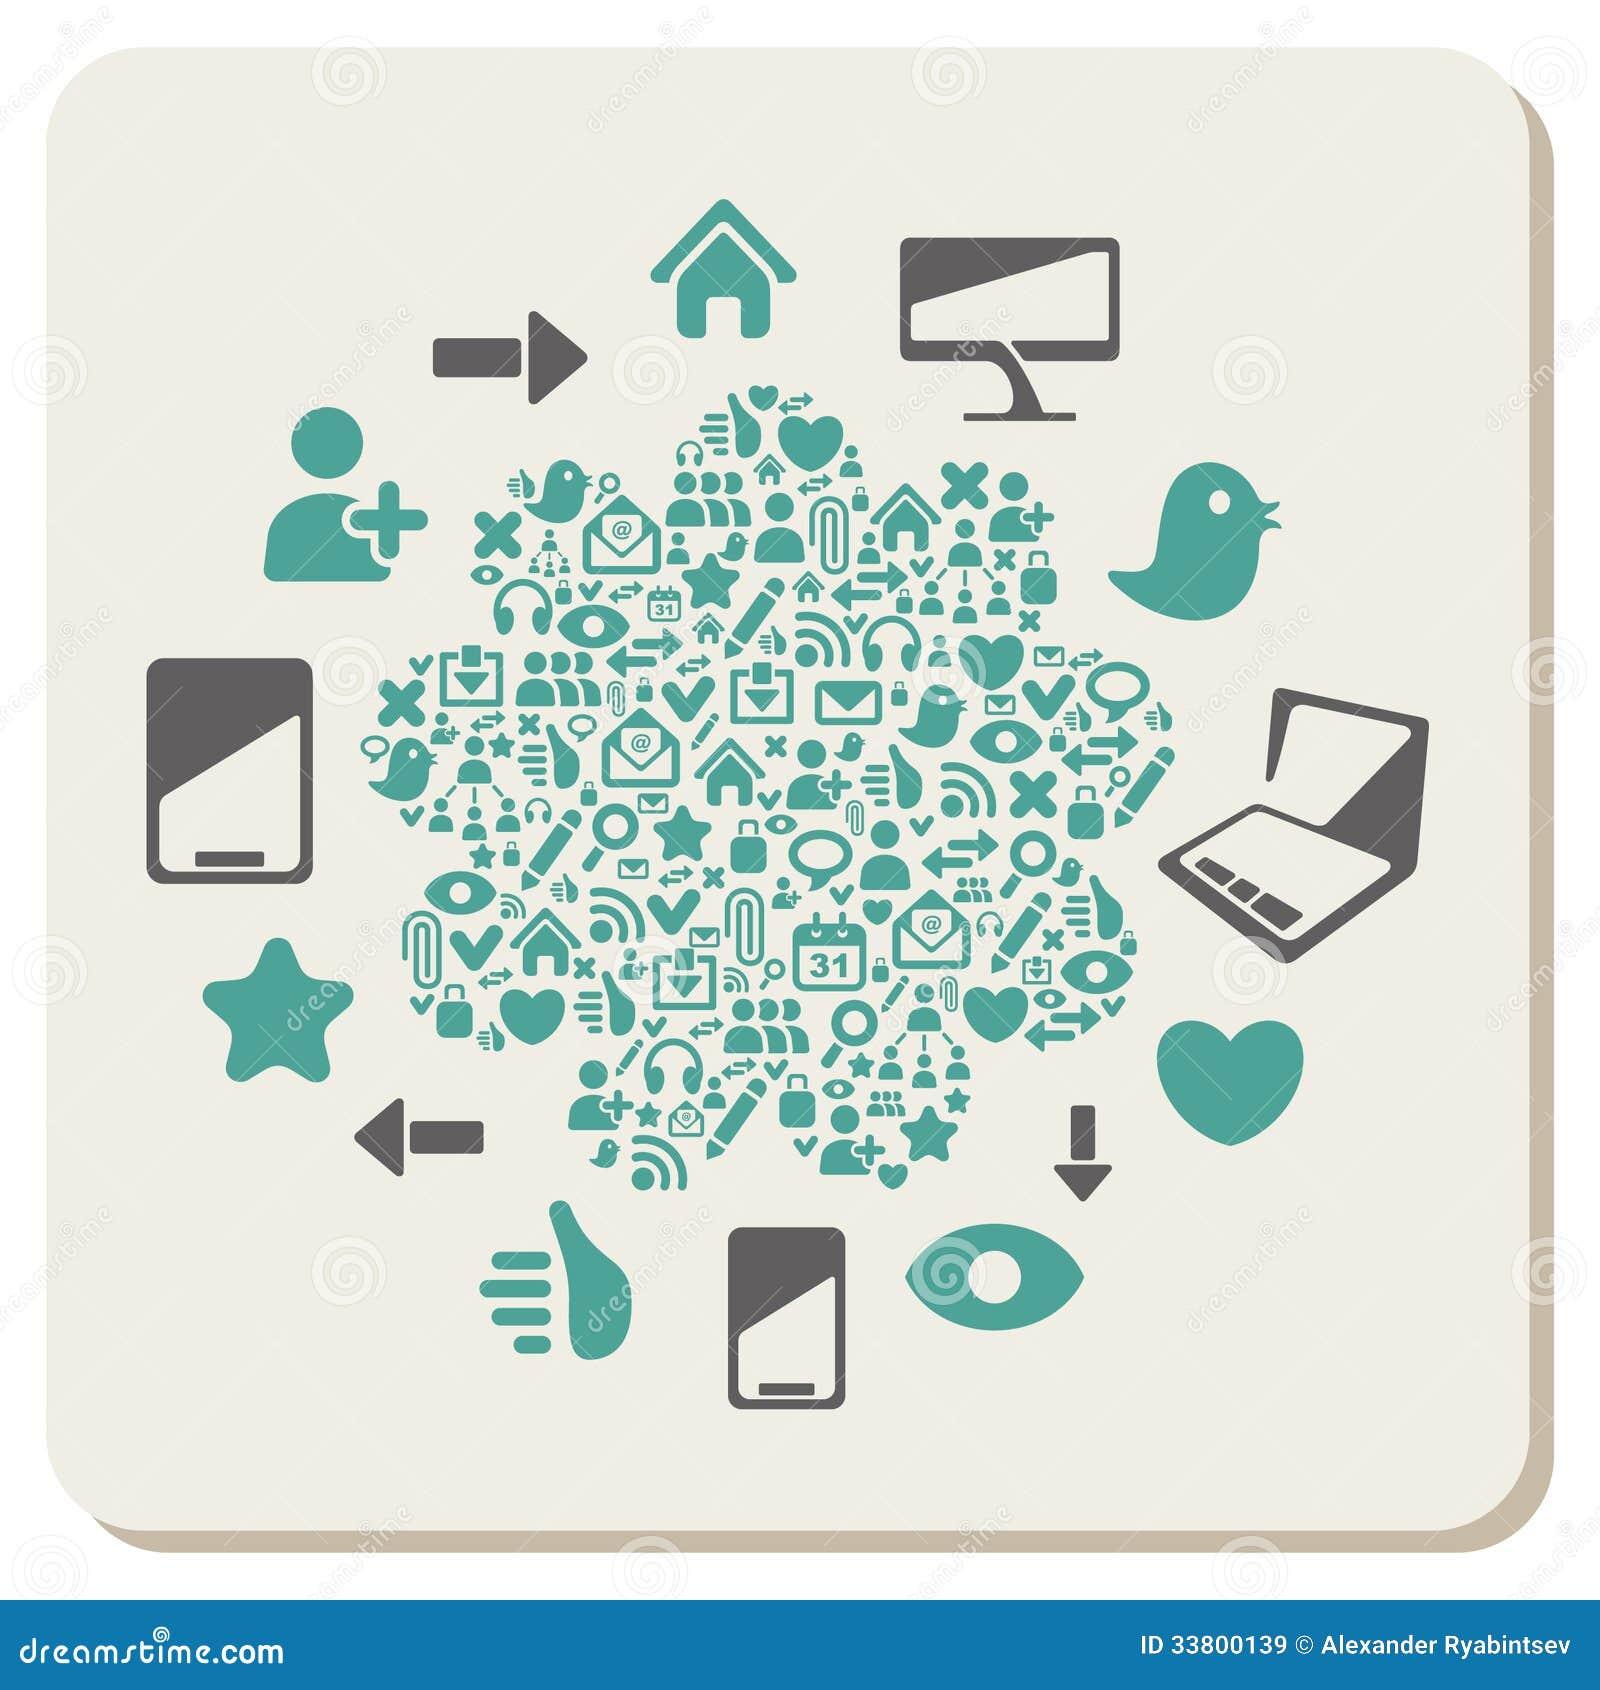 Unlimited Home Internet Plans Images